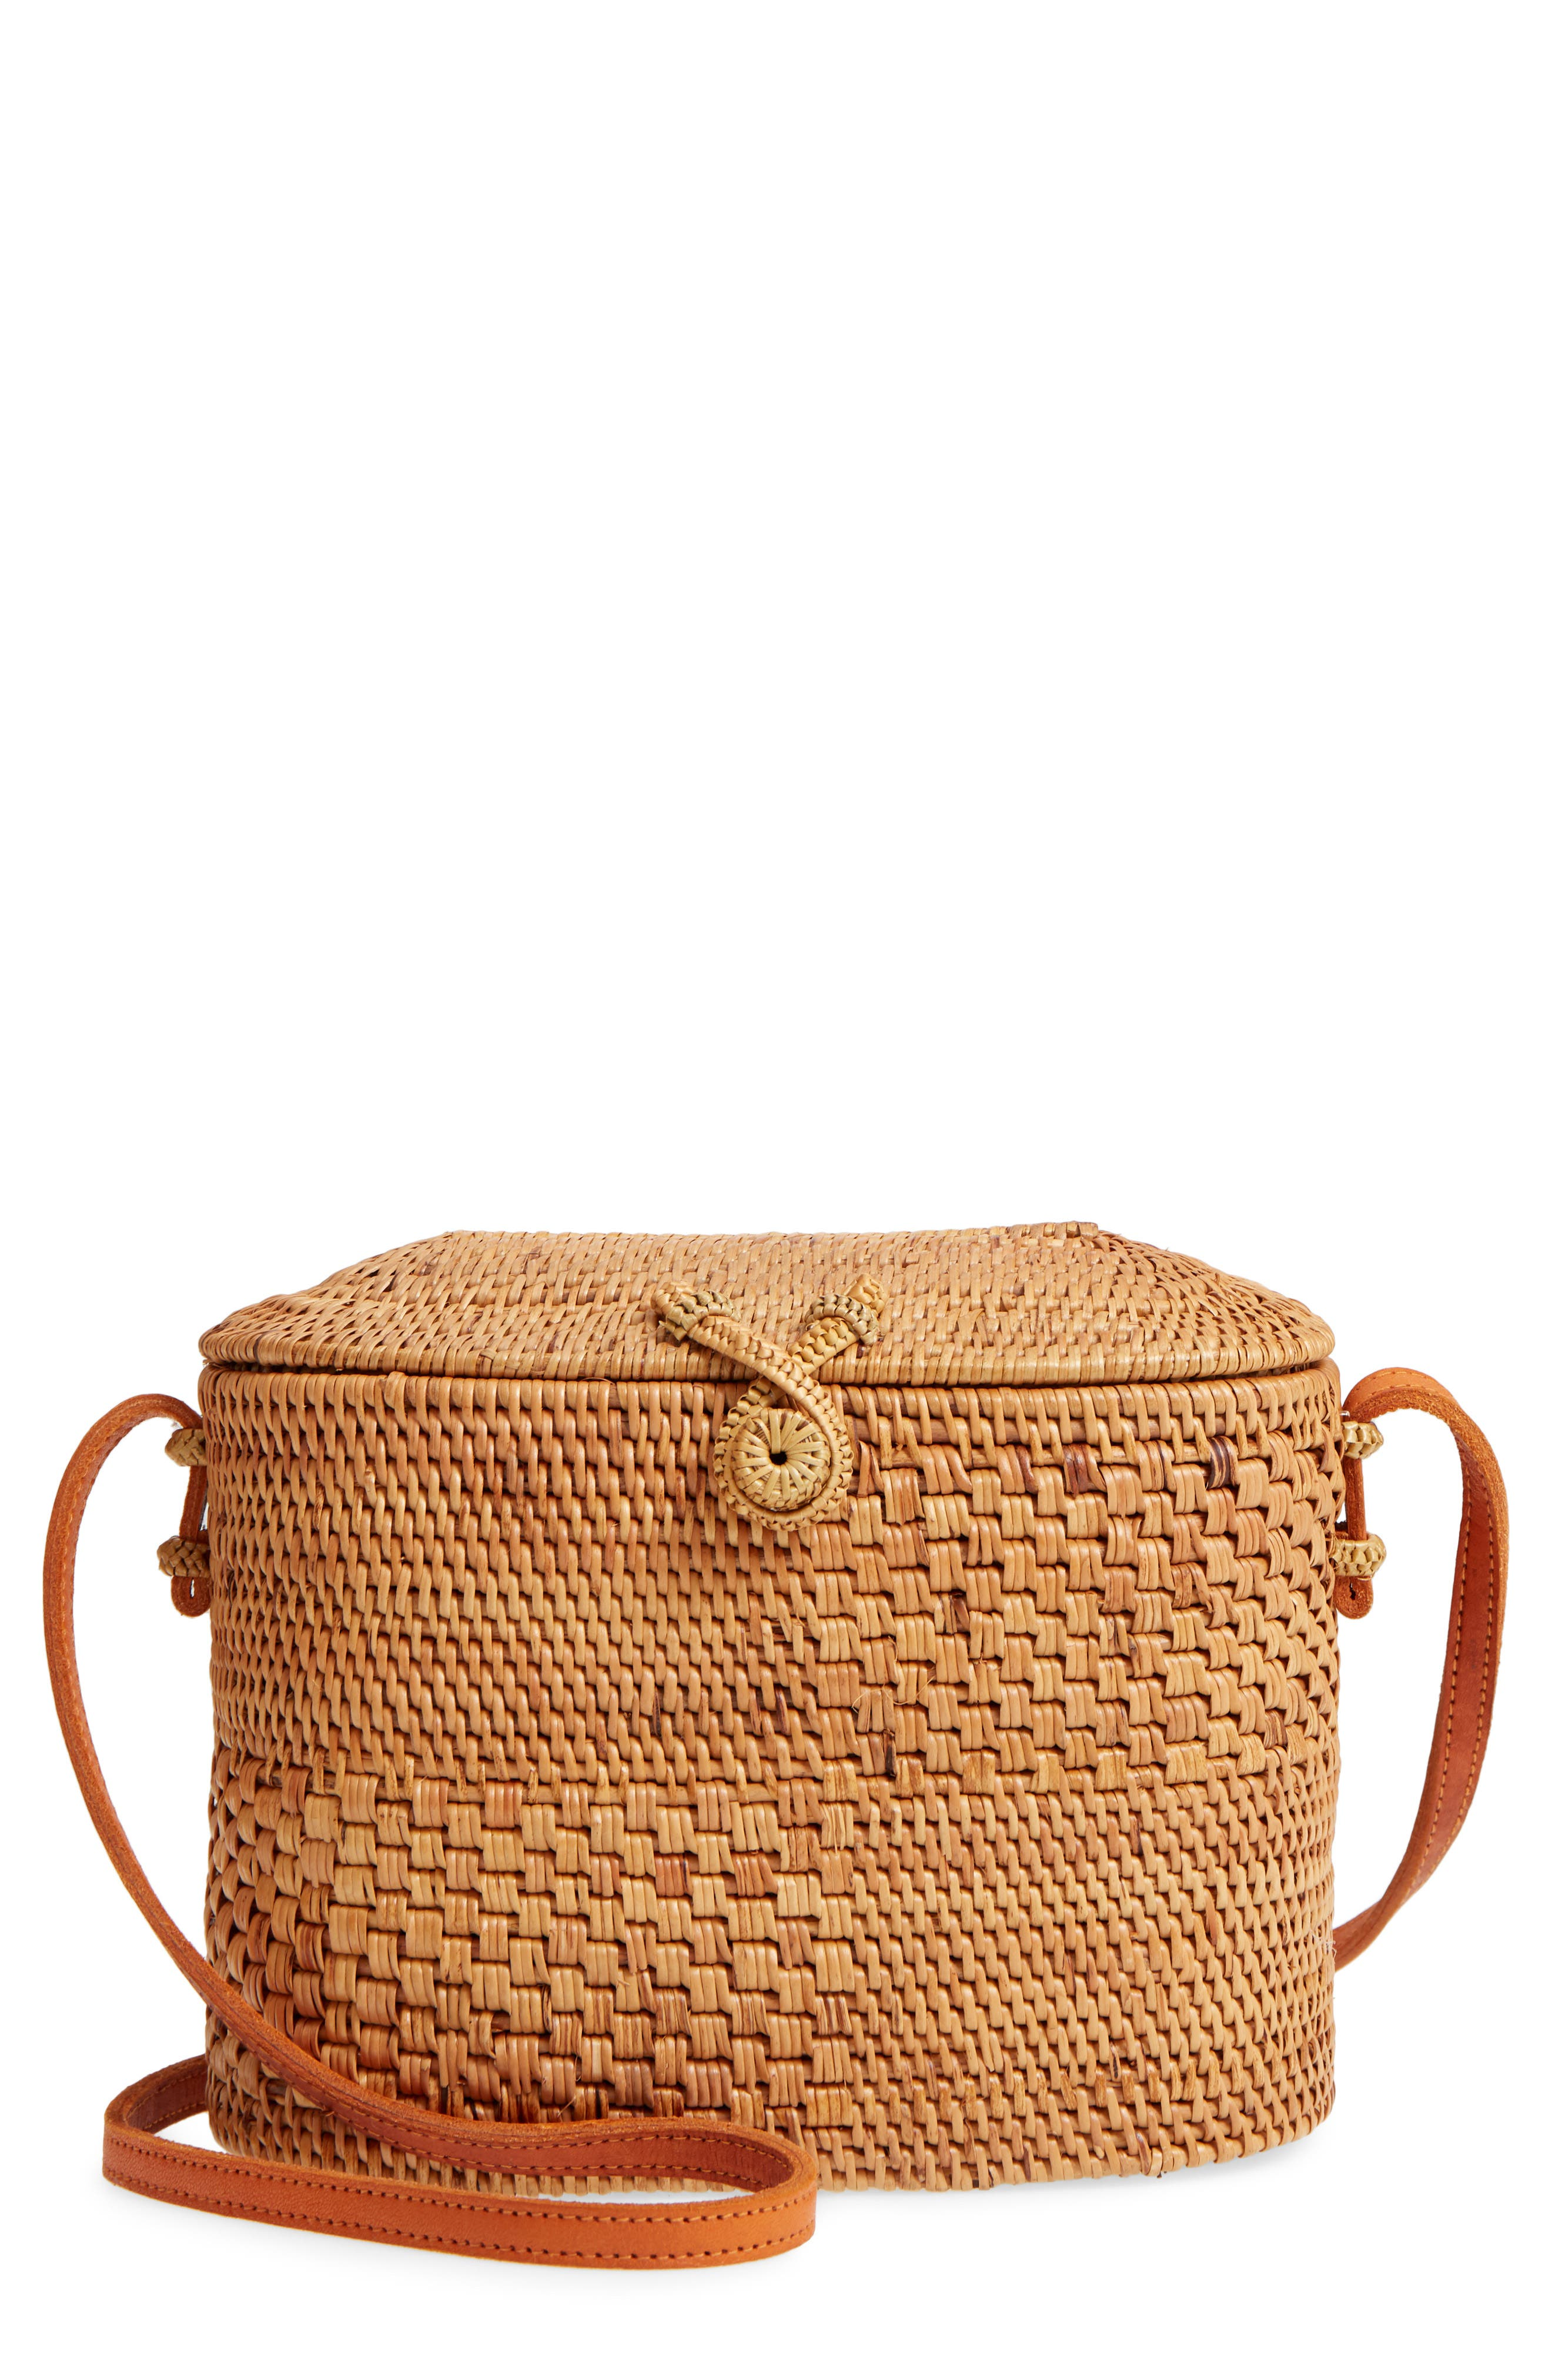 Woven Rattan Box Crossbody Bag,                             Main thumbnail 1, color,                             200